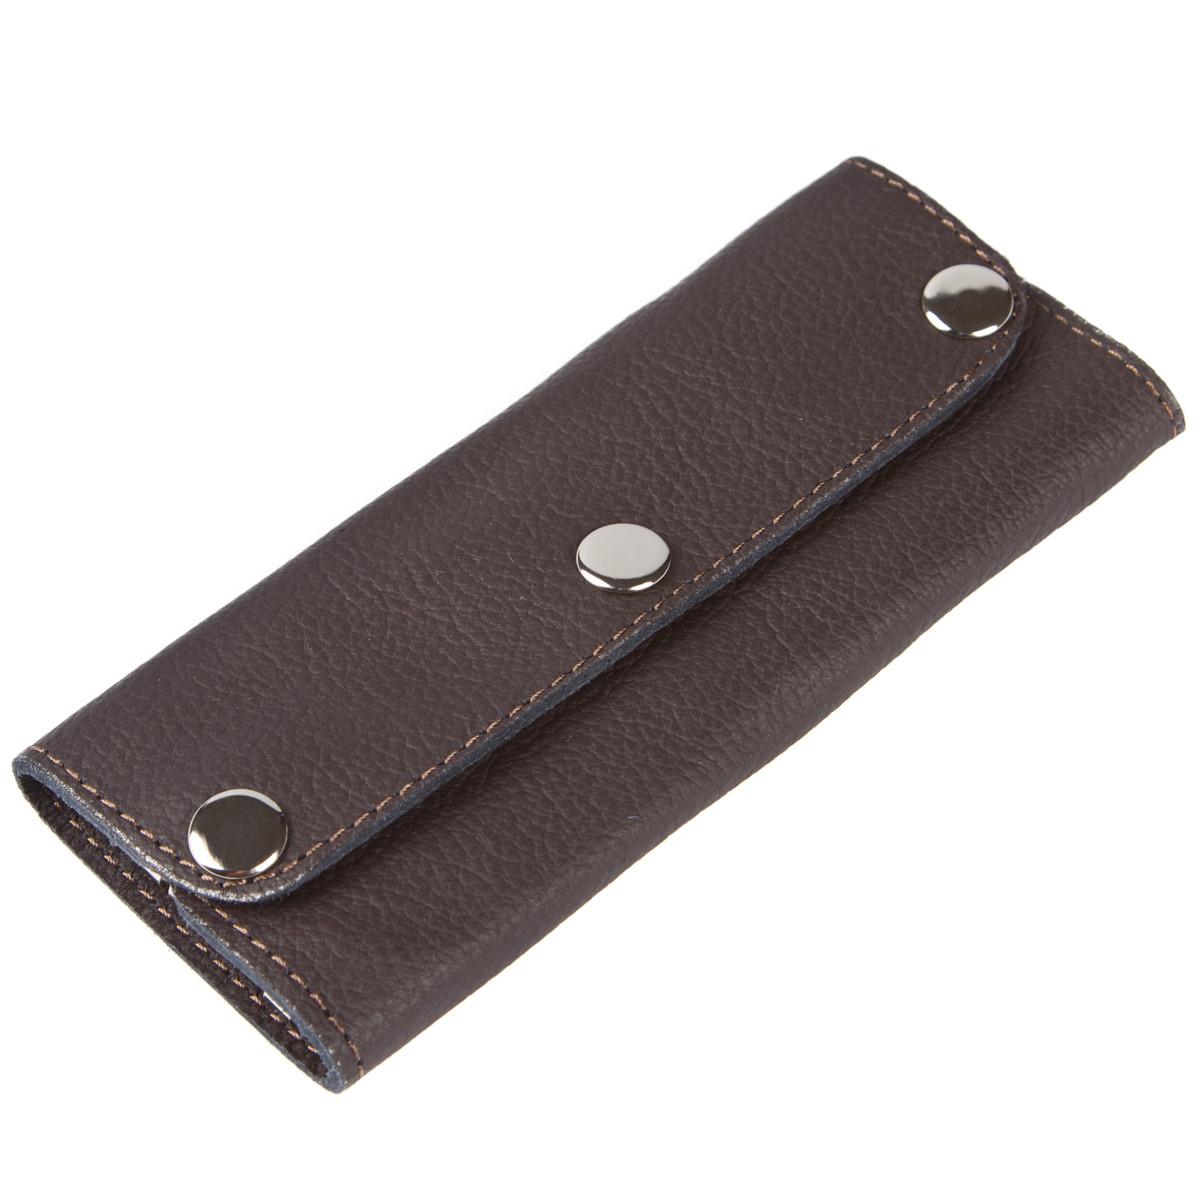 Ключниця-шкіряне портмоне на 6 ключів BagHouse 15х6,5х2,5 клКН15кор